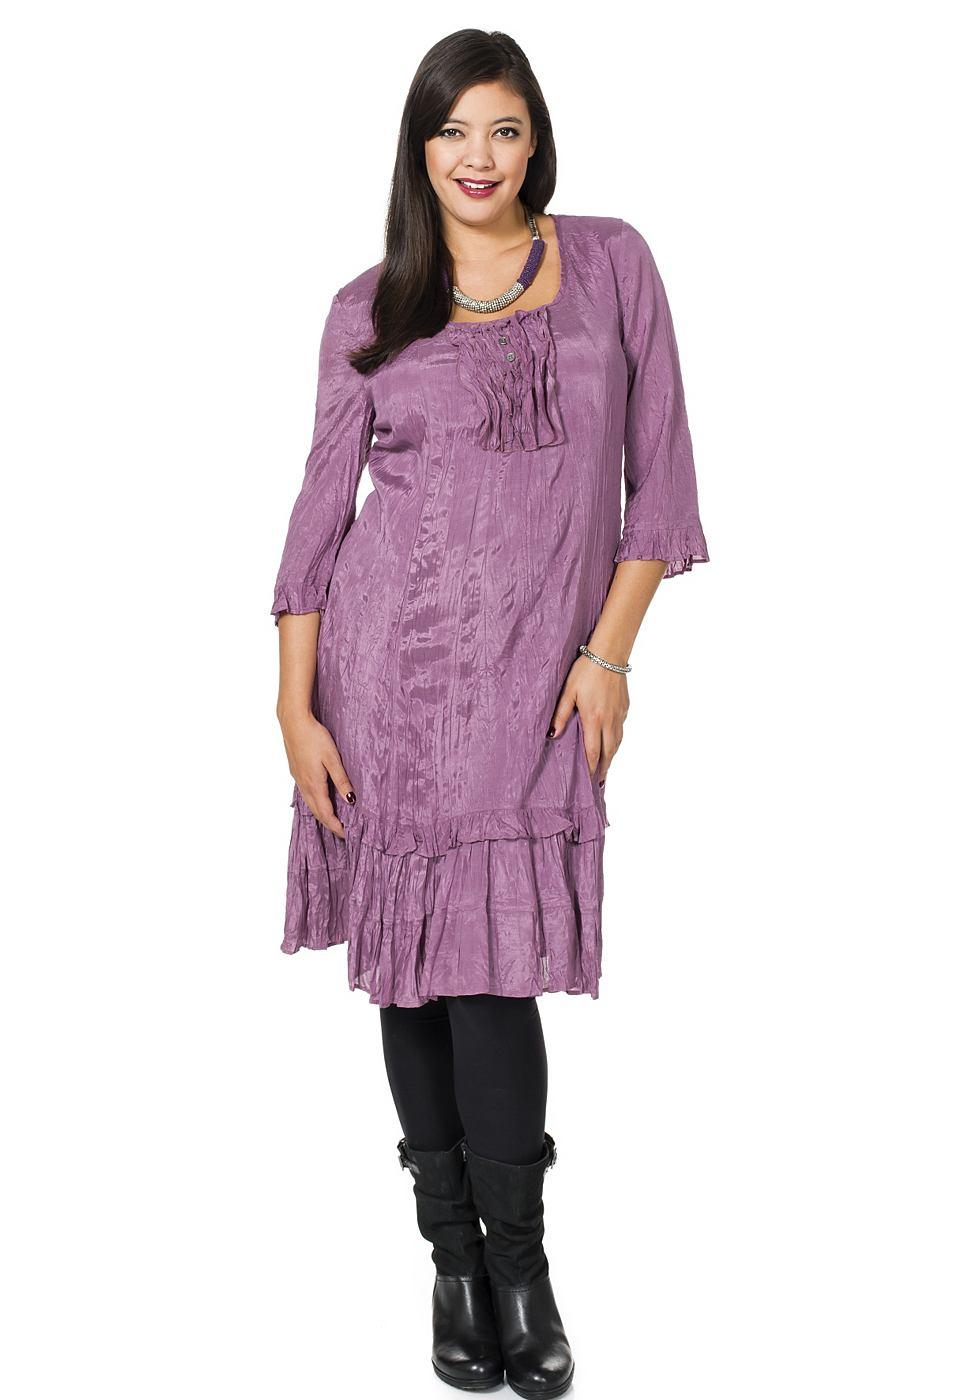 Sheego Style jurk paars